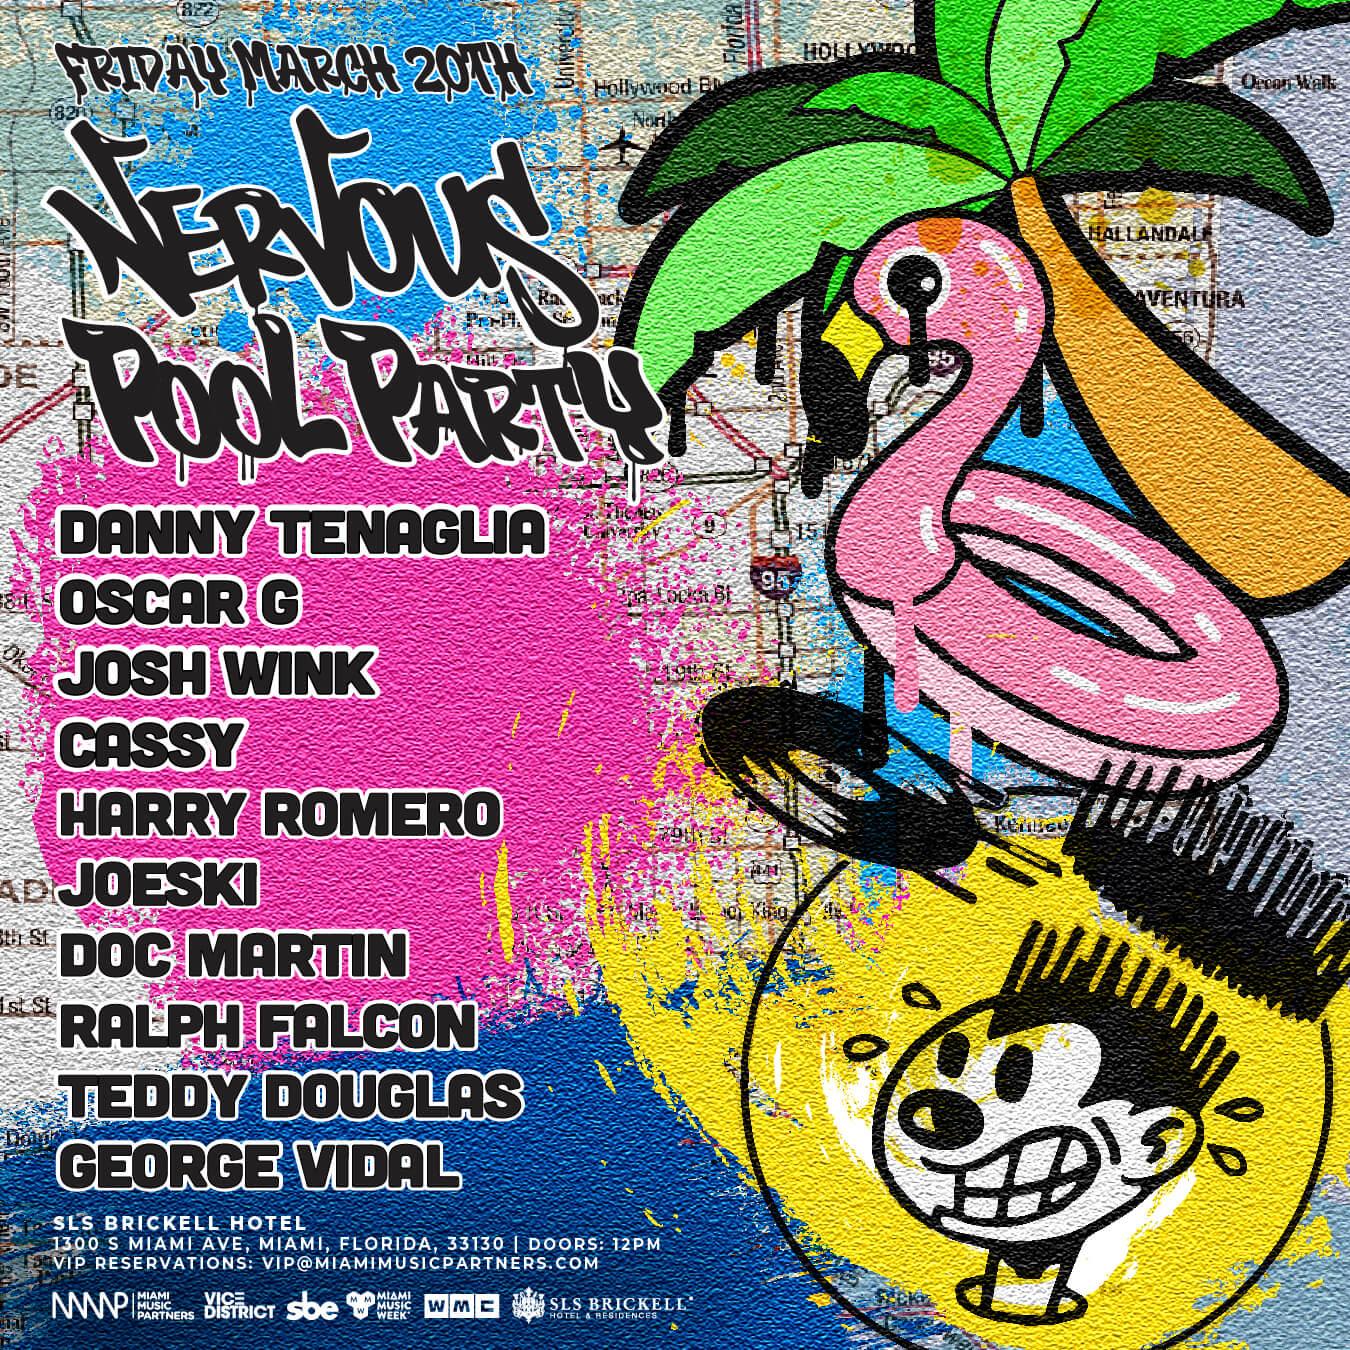 Nervous Pool Party Flyer